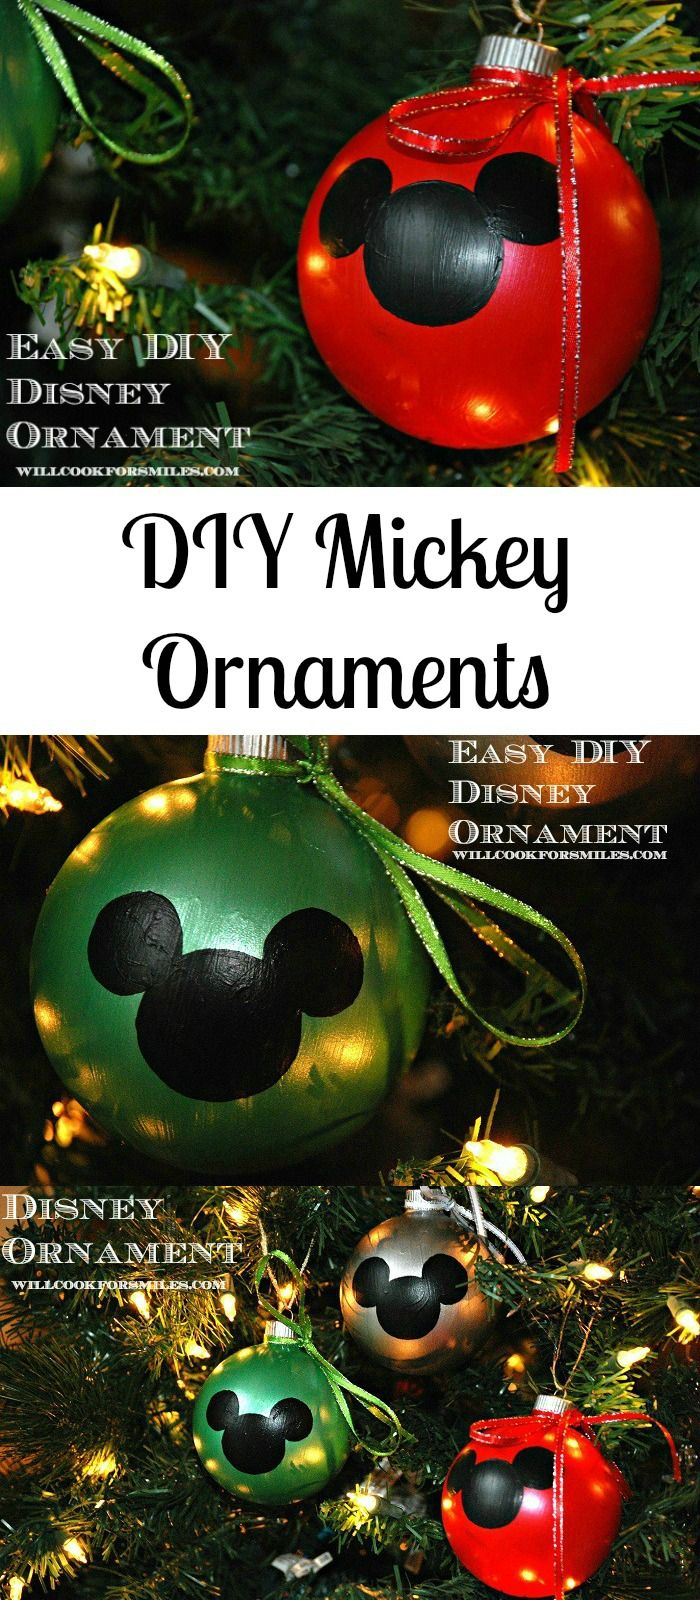 Easy DIY Disney Ornaments | from willcookforsmiles.com #ornaments #disney